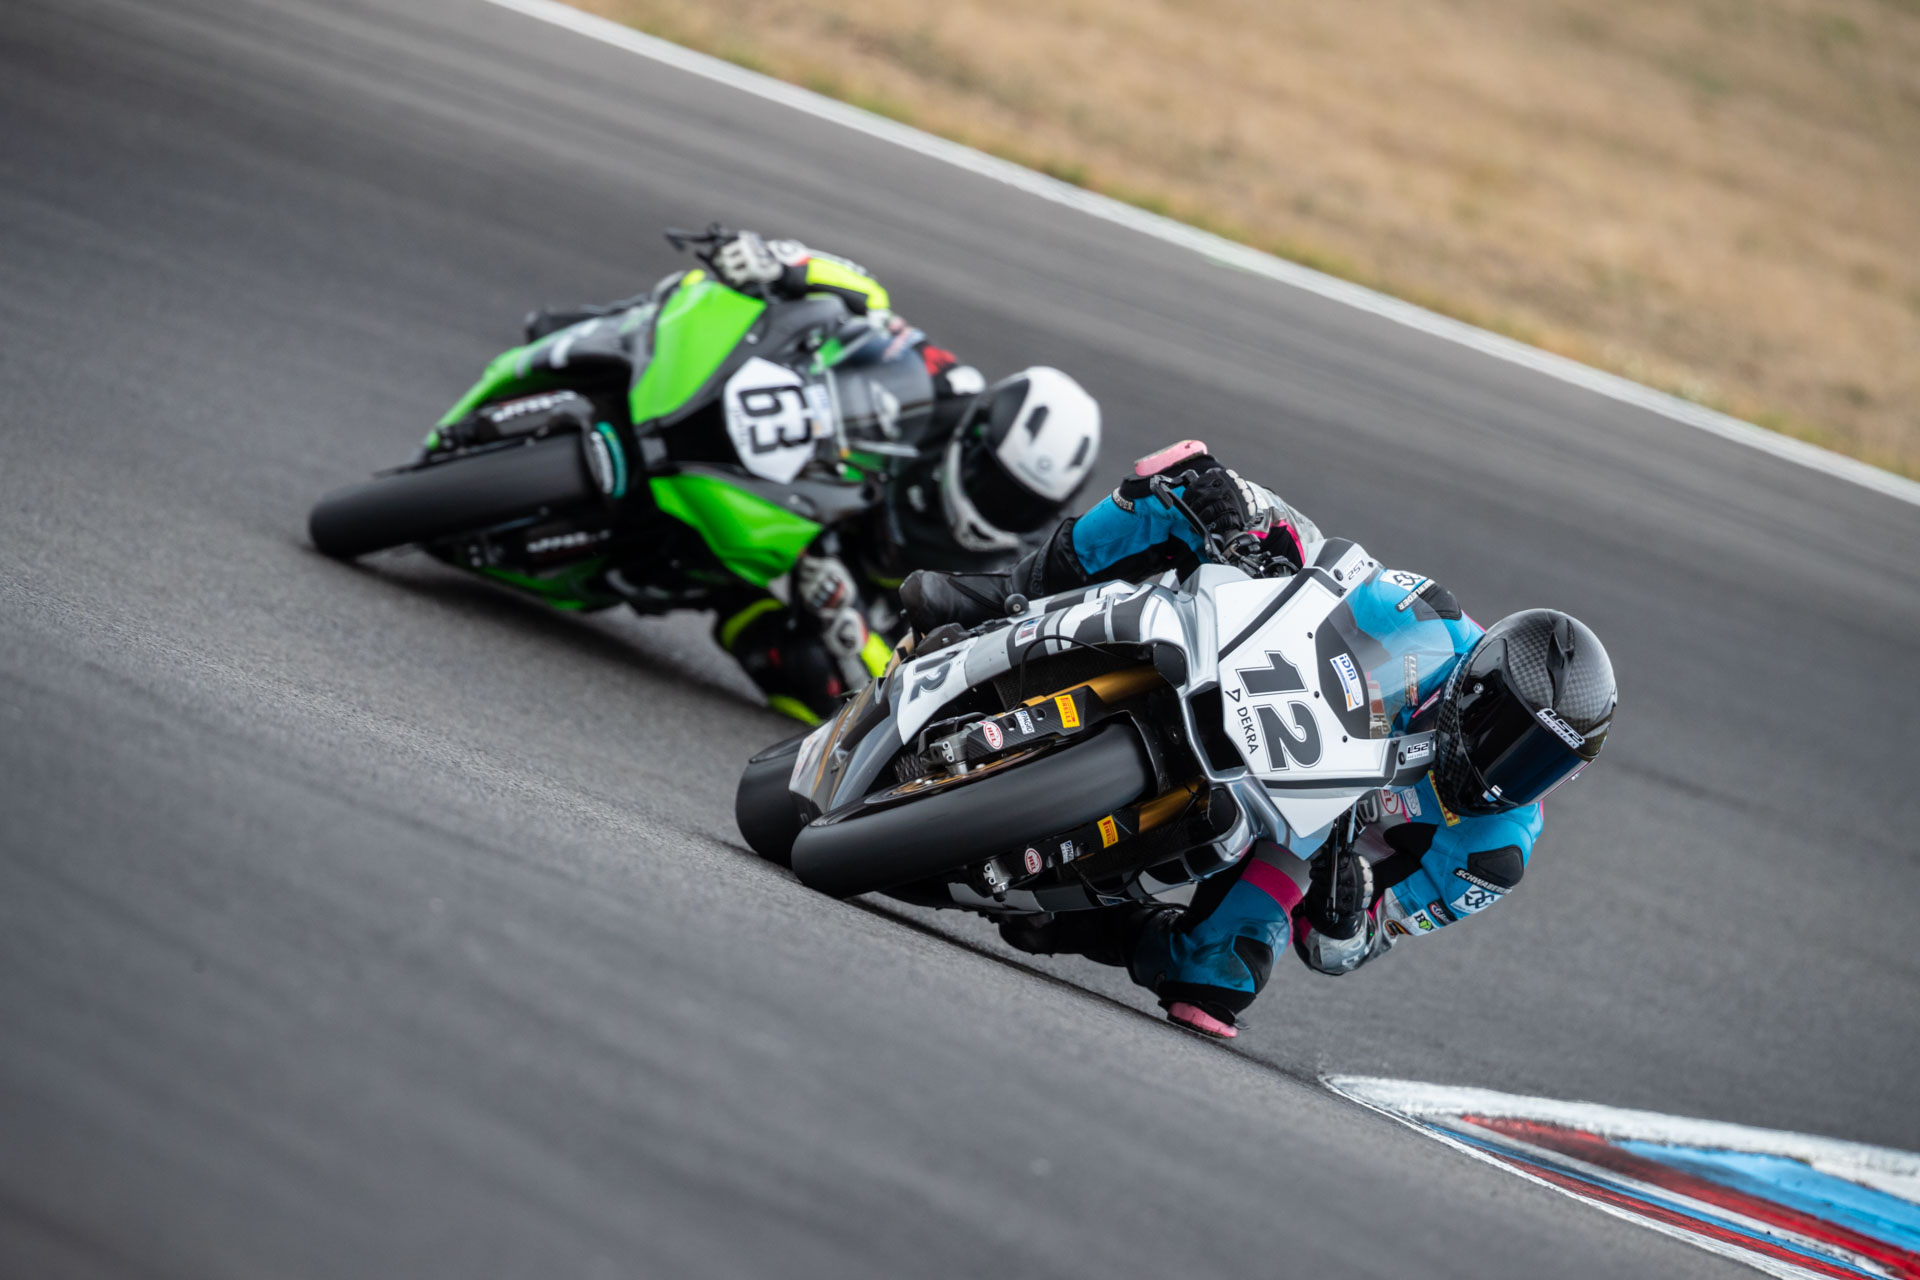 IDM_Lausitzring2018_SBK-Quali-web-45